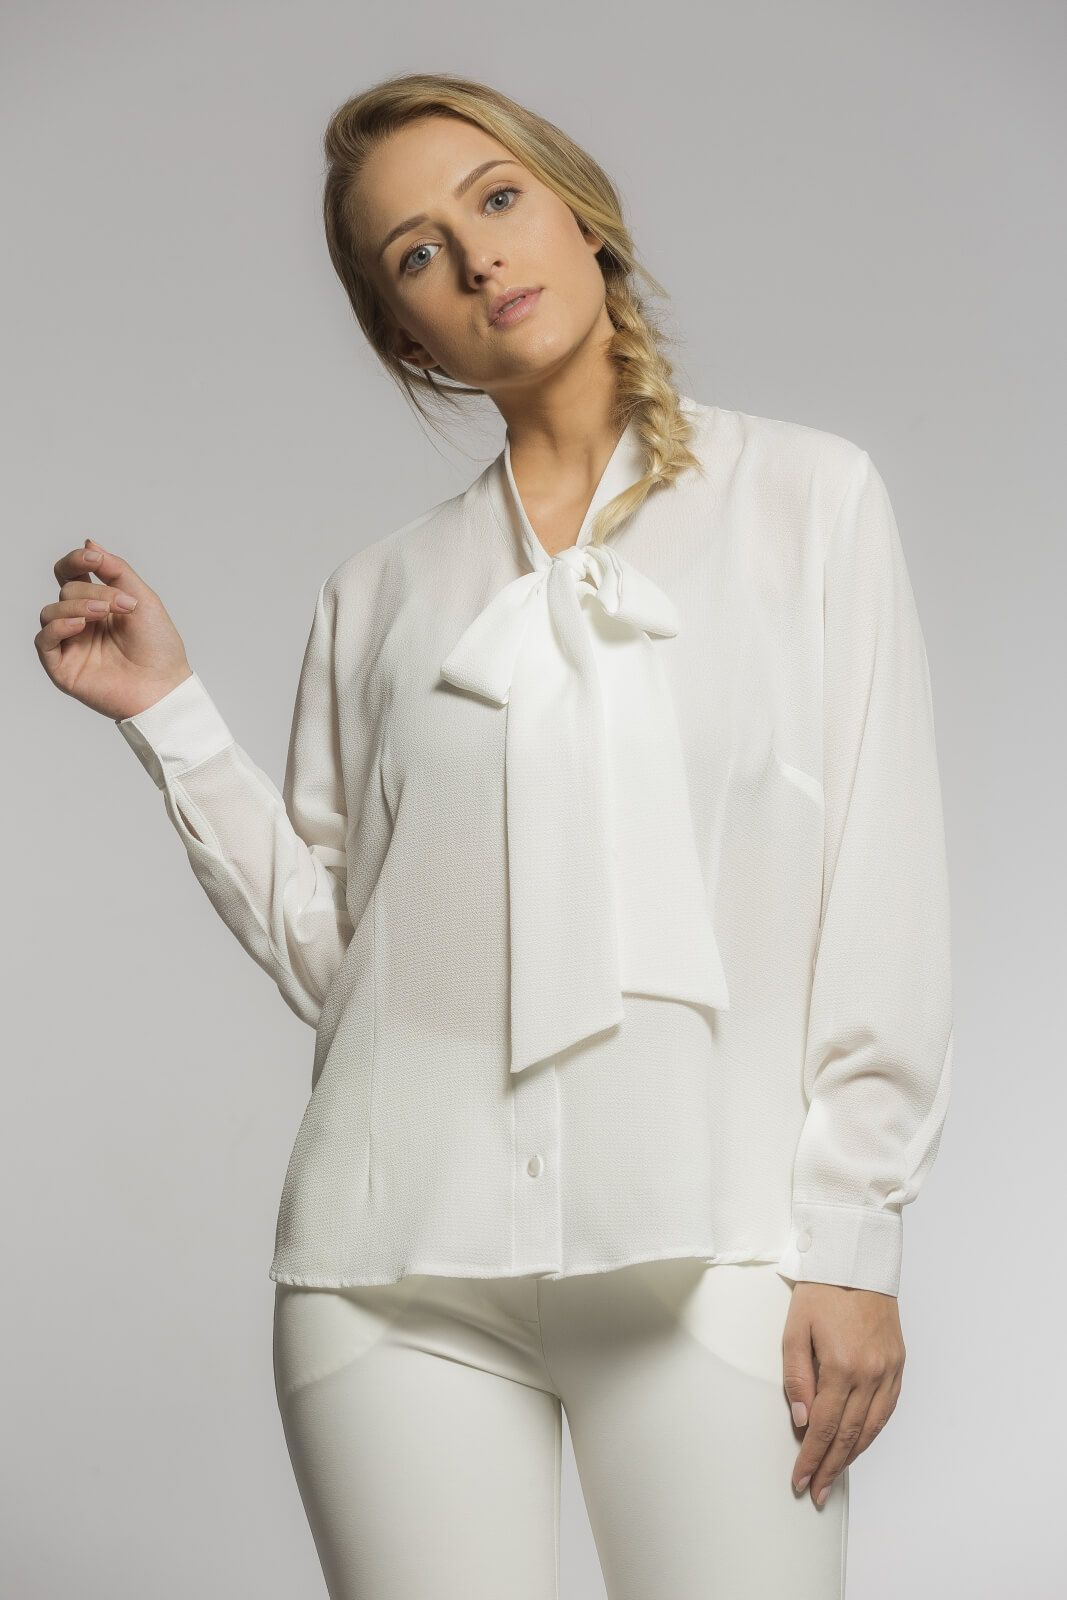 Camisa Feminina Gola Laço Crepe Off White